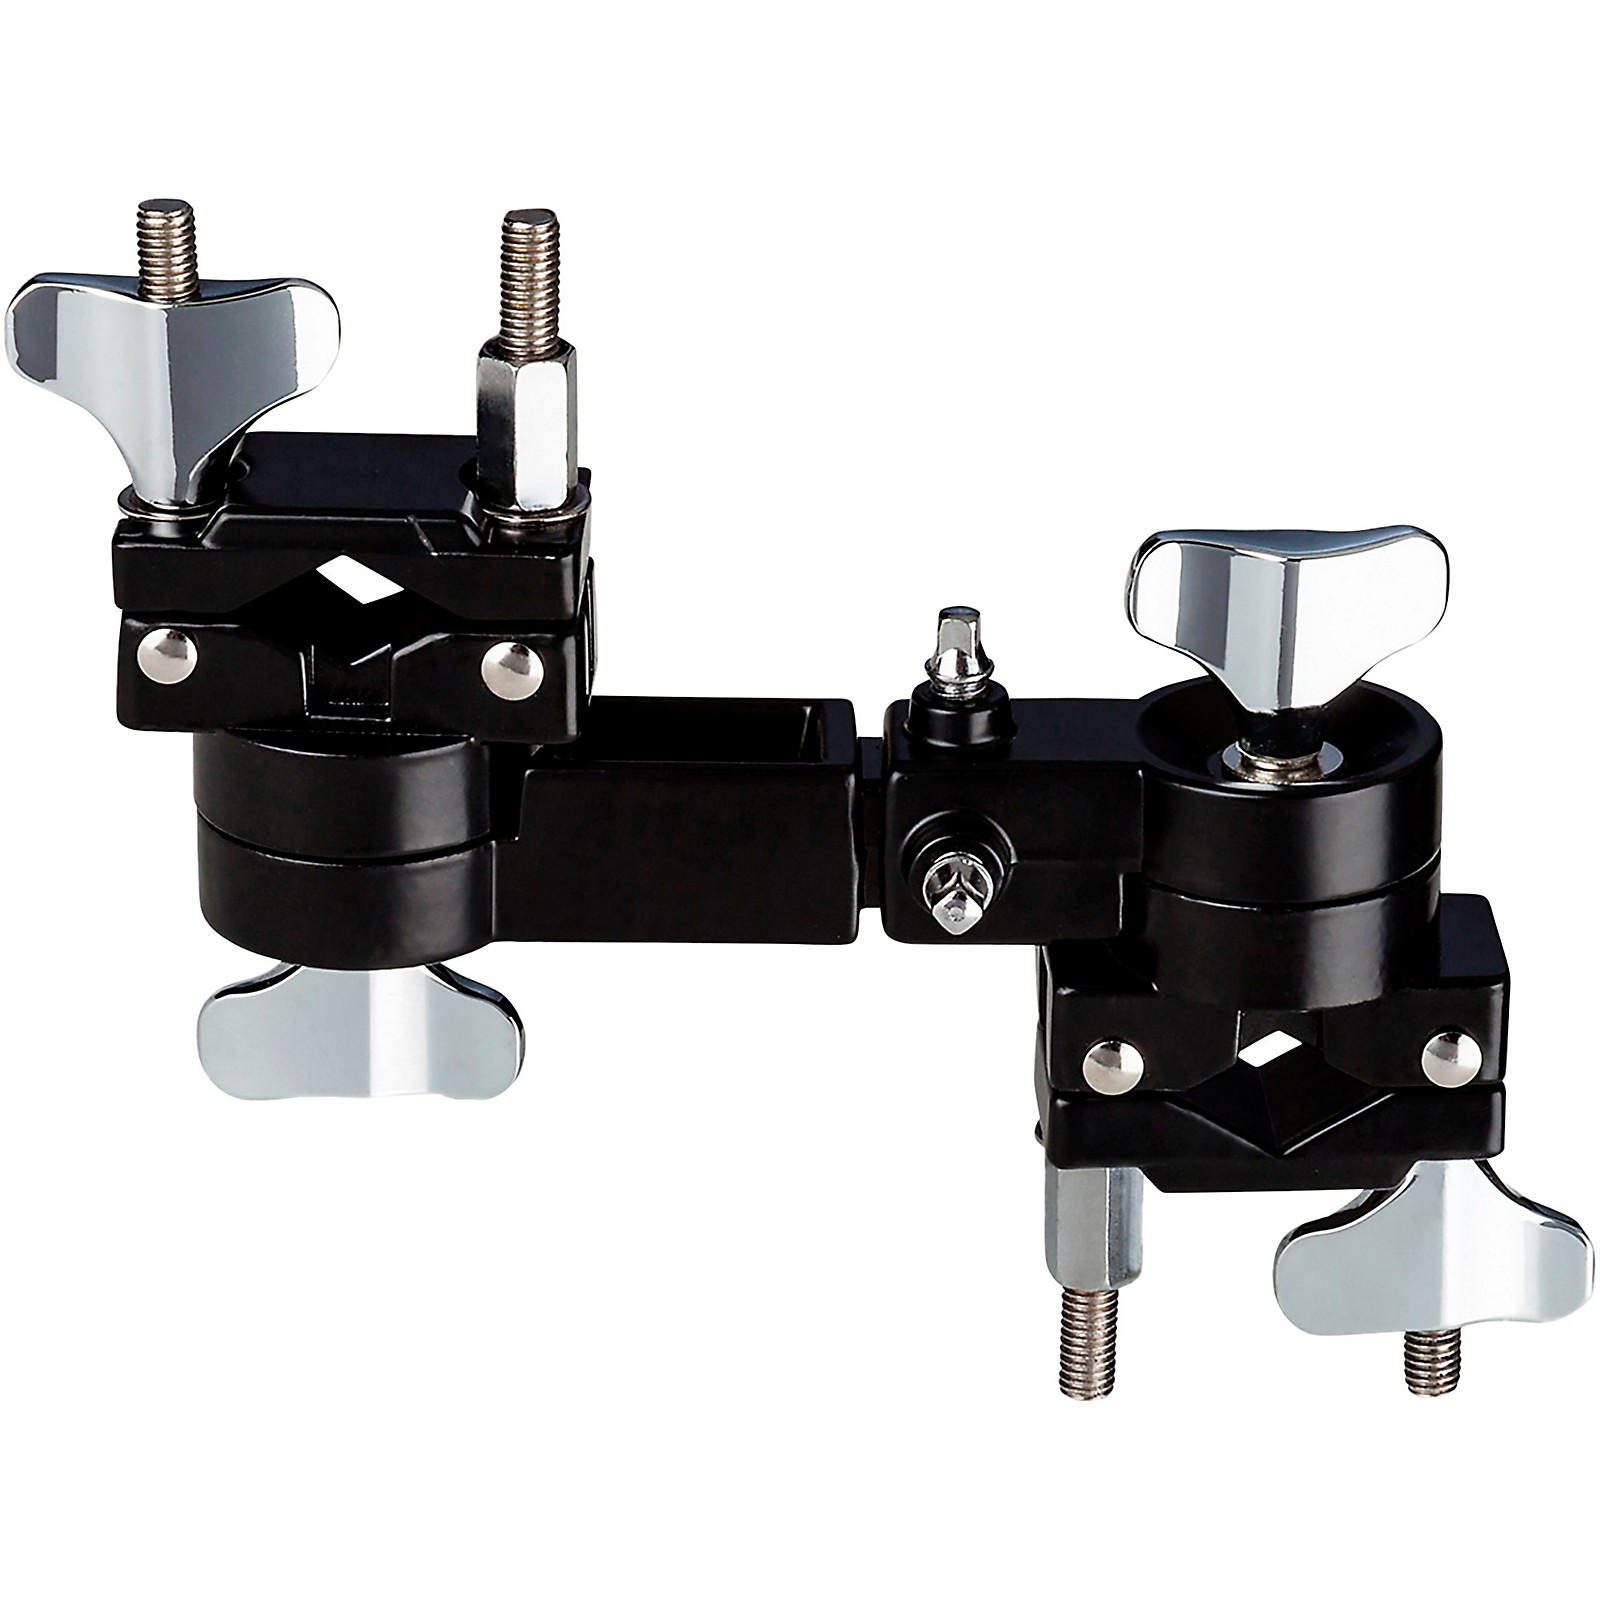 ddrum RX Series Multi Adjustable Clamp